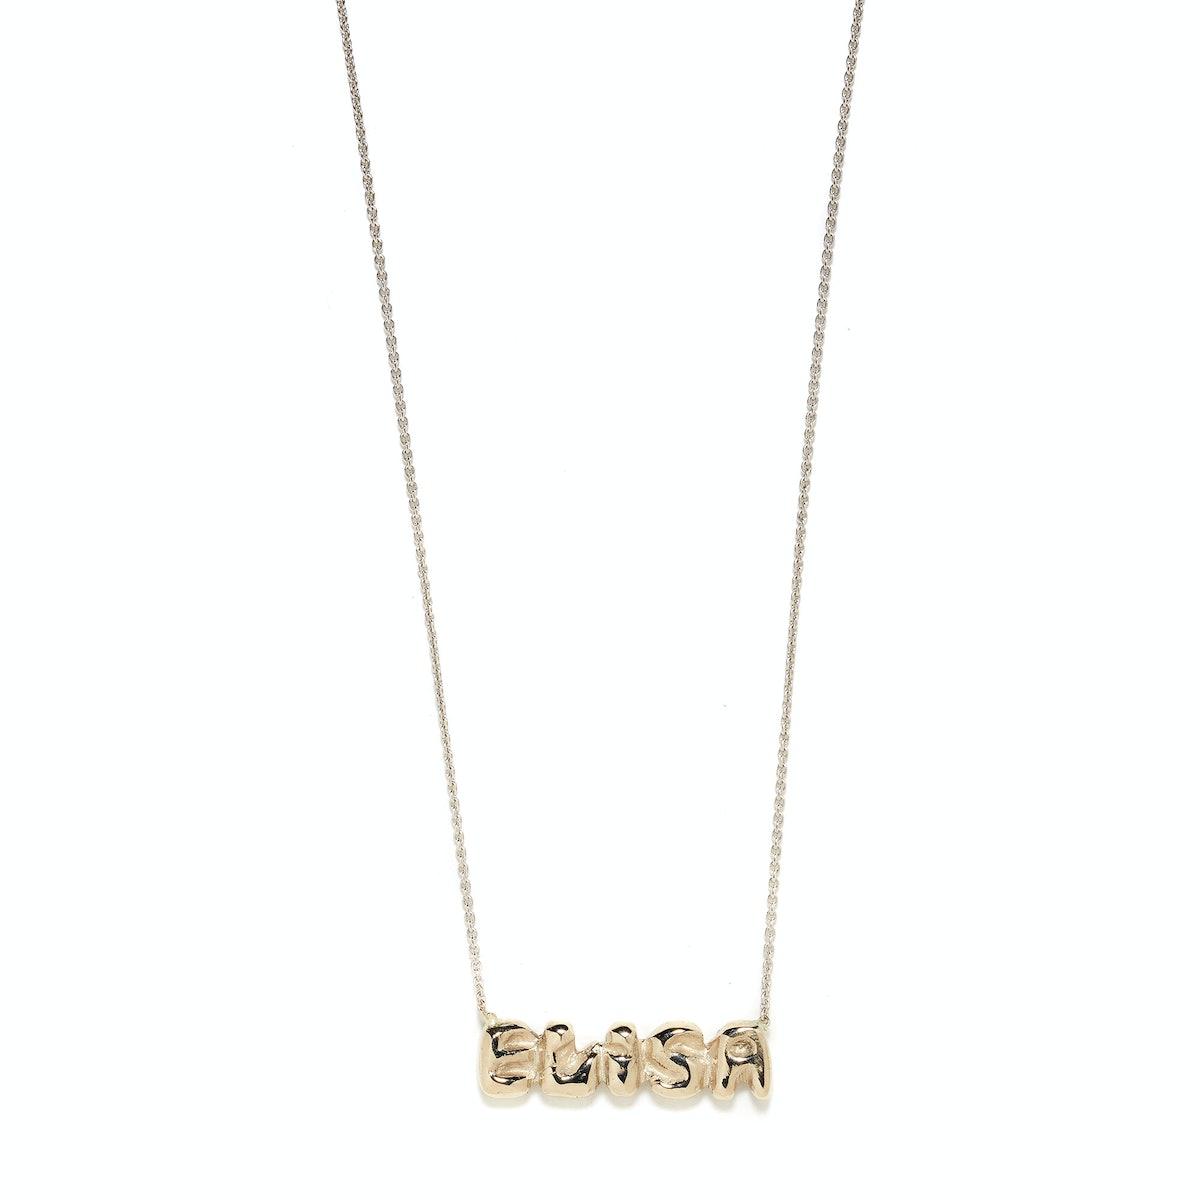 Elisa Solomon 18 karat white gold name plaque necklace